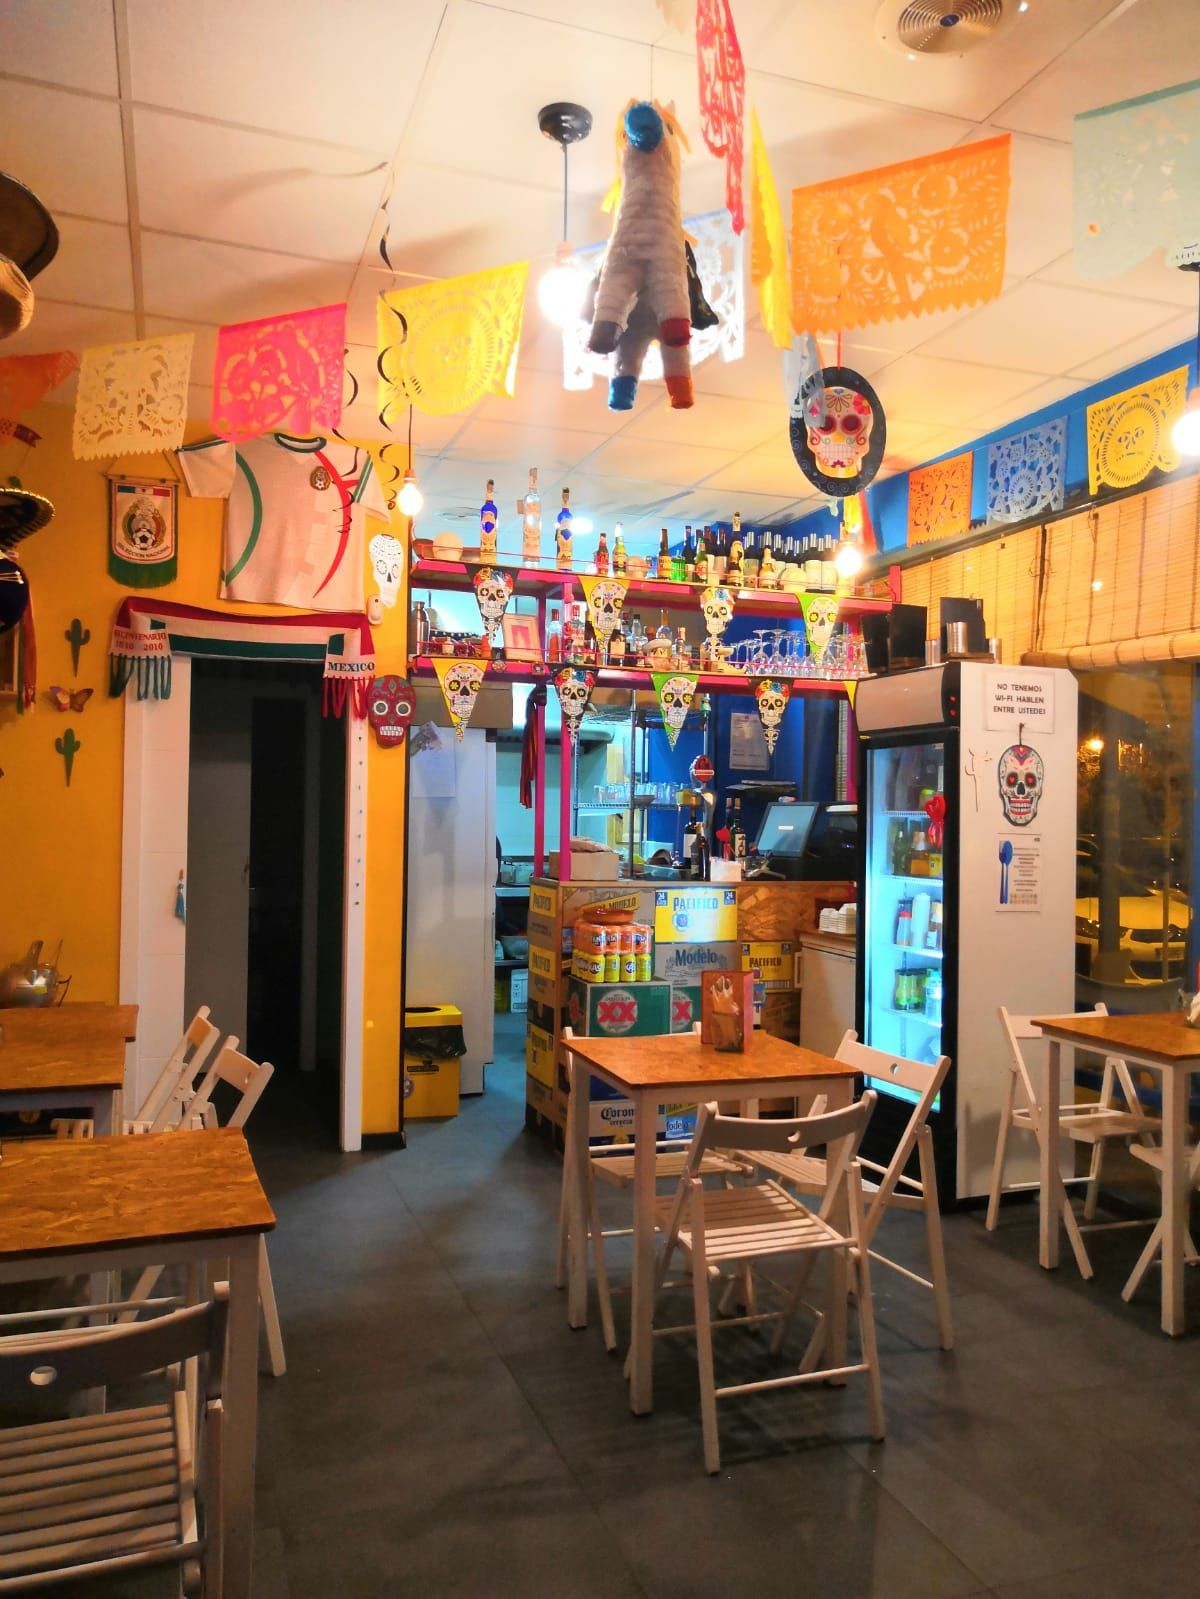 Foto 14 de Restaurante mexicano en  | Cantina La Catrina